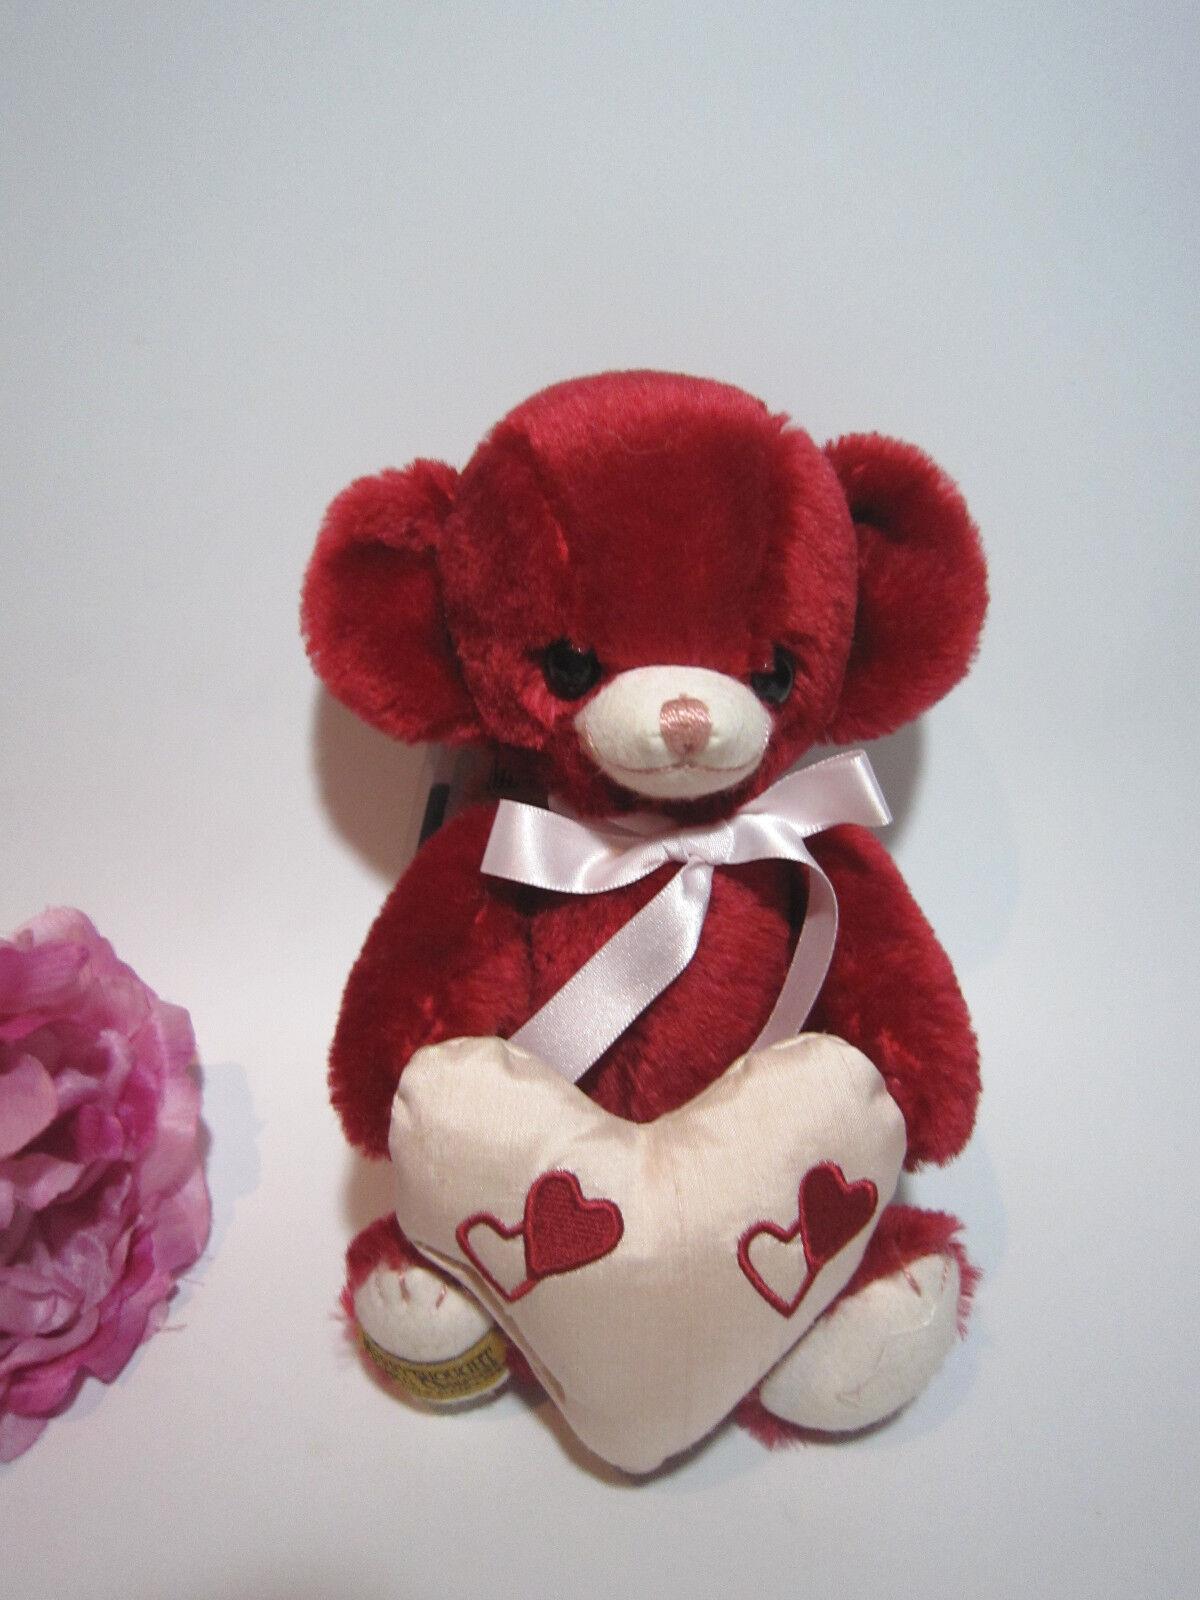 Merrythought rot rot rot mohair Sweetheart Cheeky bear 8''. Ltd.Gorgeous. e8ae66